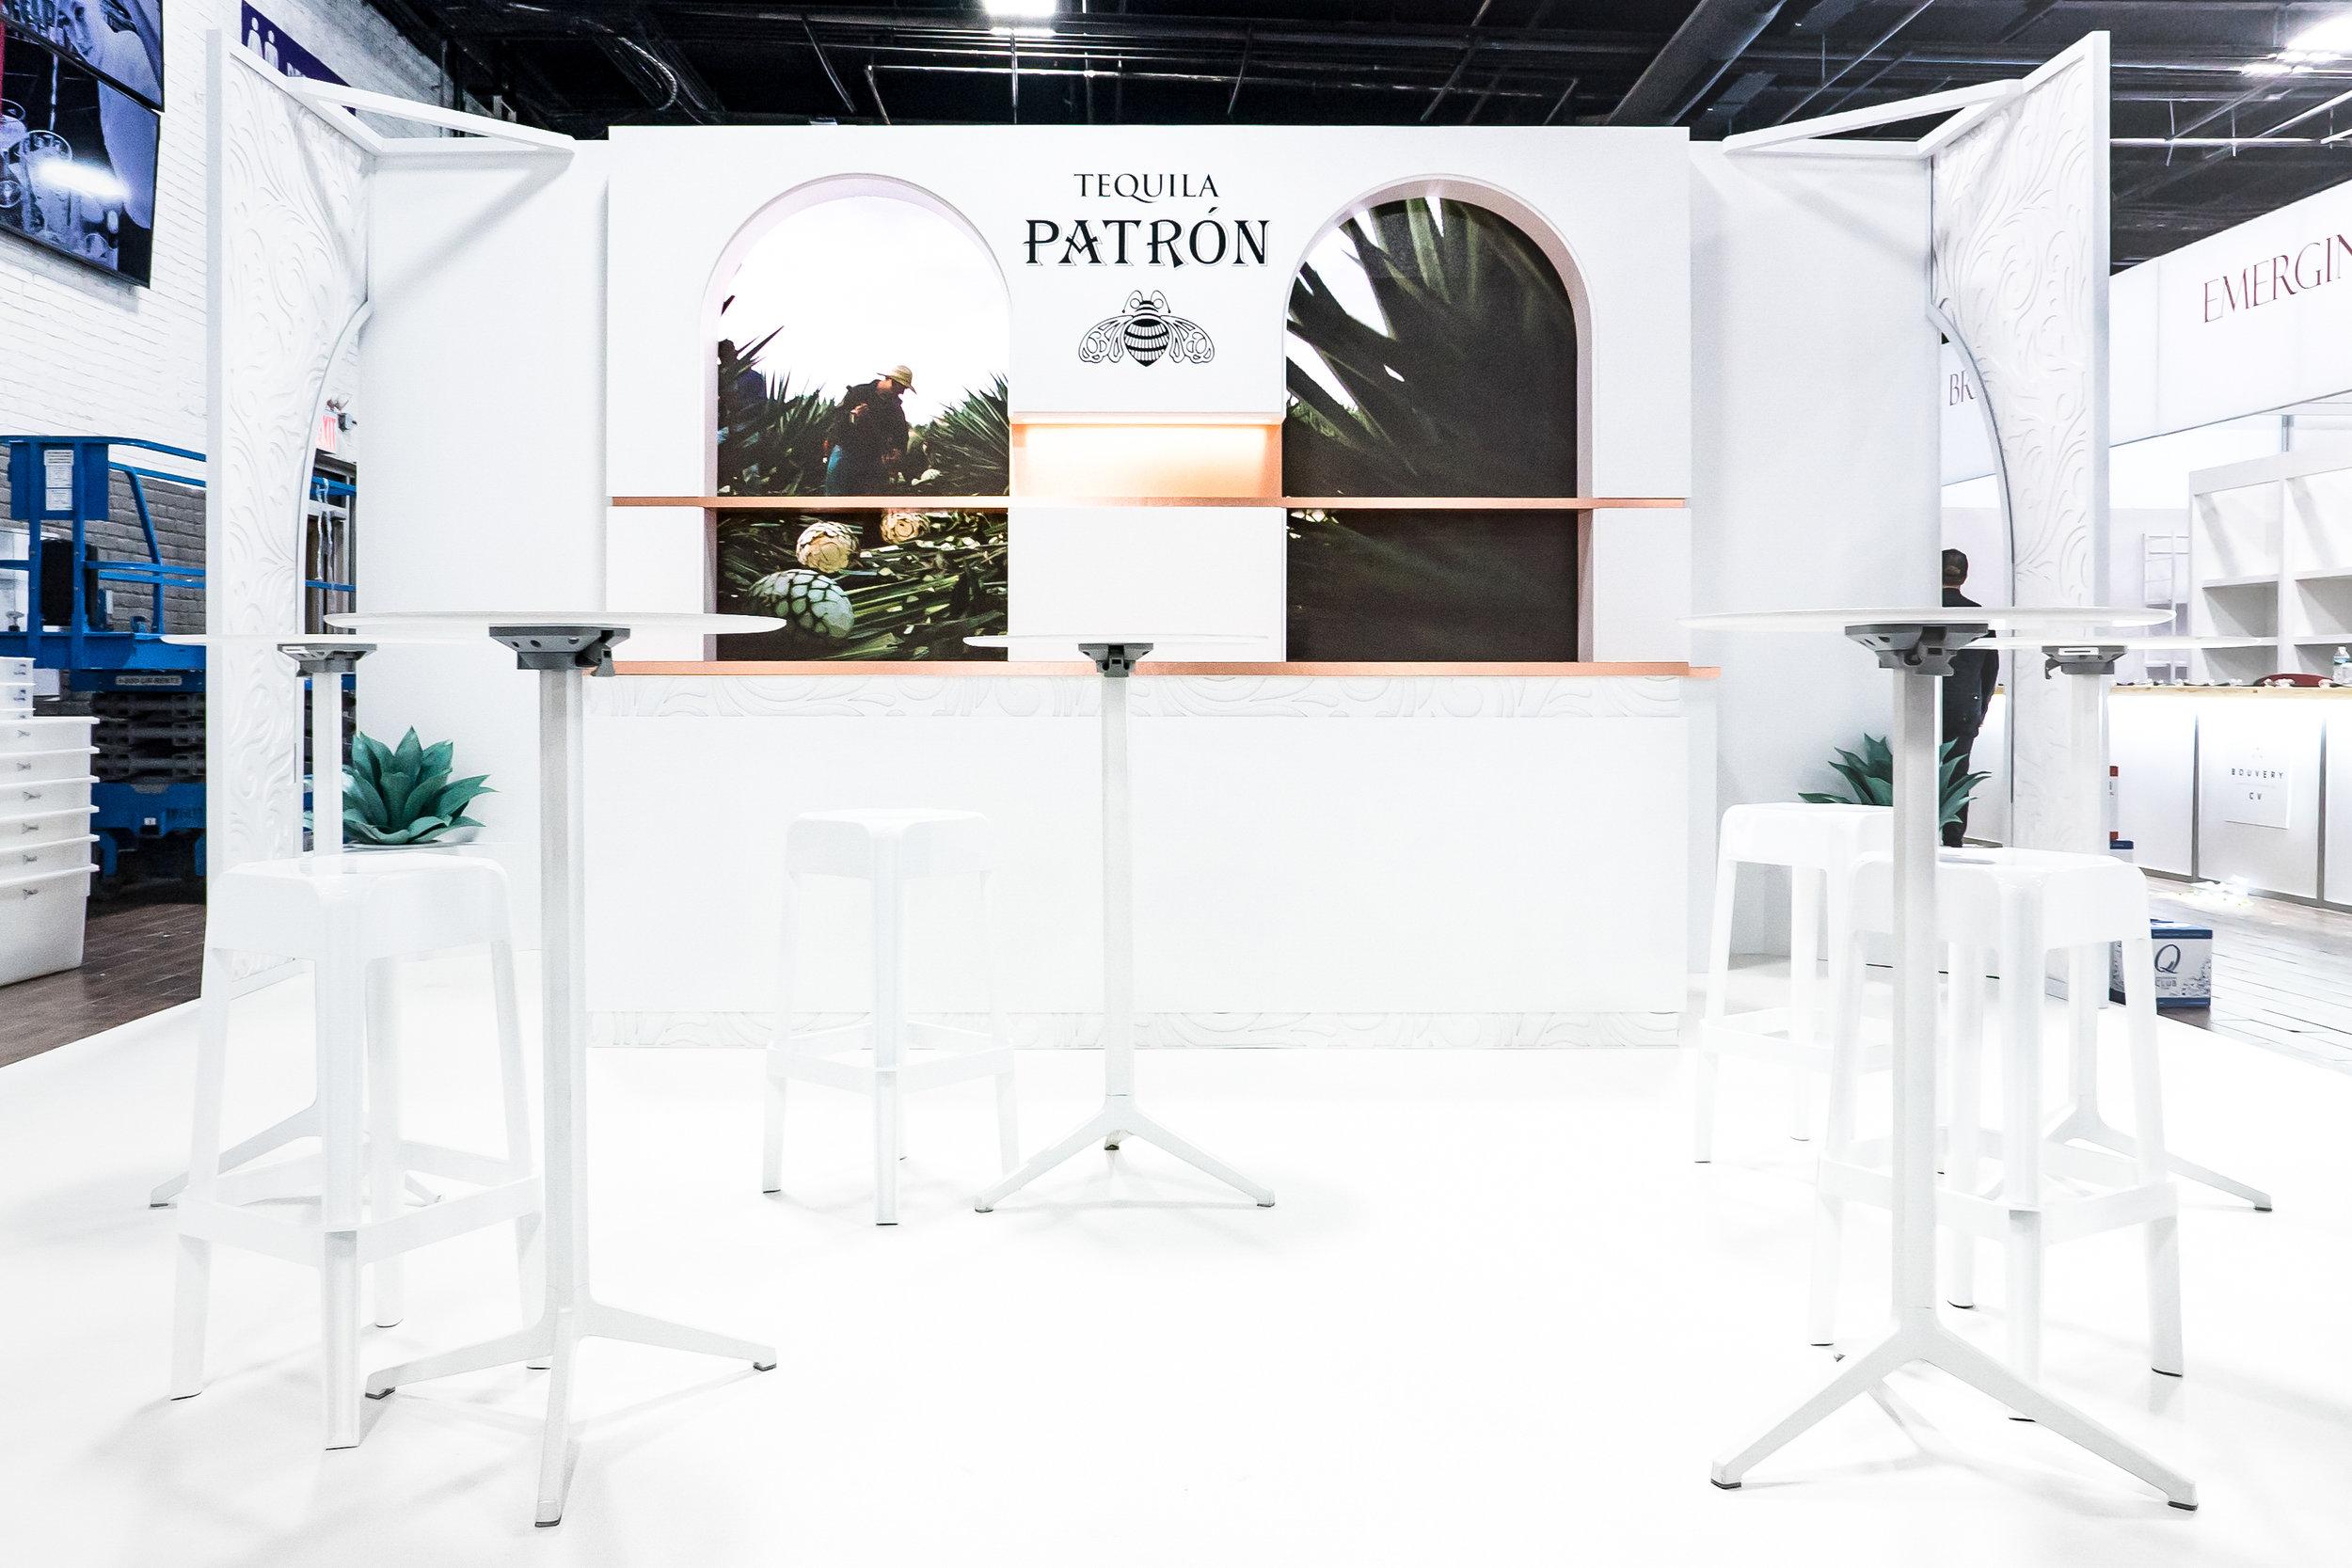 PATRON HACIENDA_WEBSITE UPDATE-4.JPG